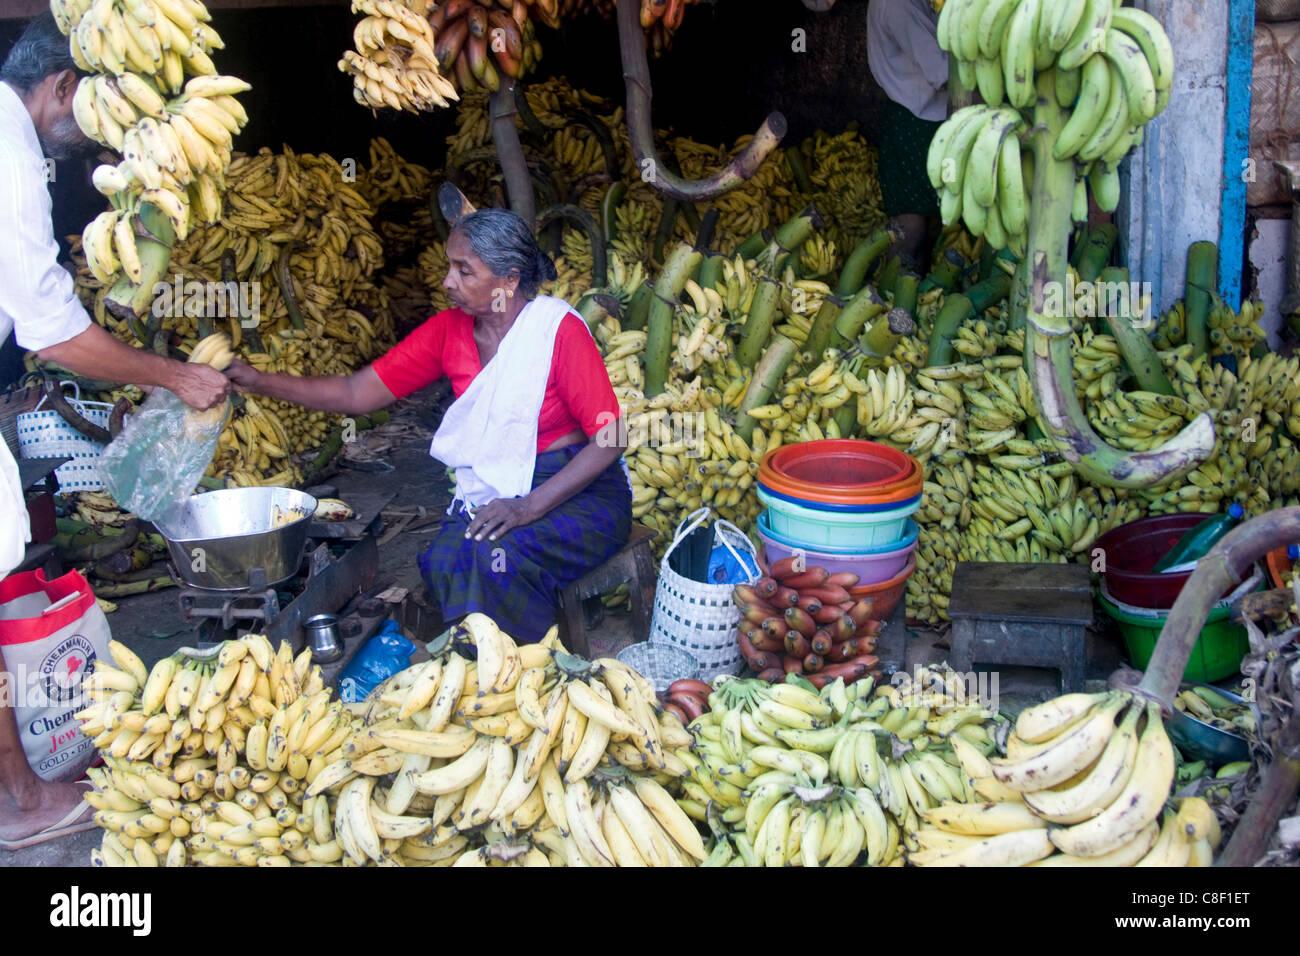 Fruit Market Kerala Stock Photos & Fruit Market Kerala ...Kerala Vegetable Market